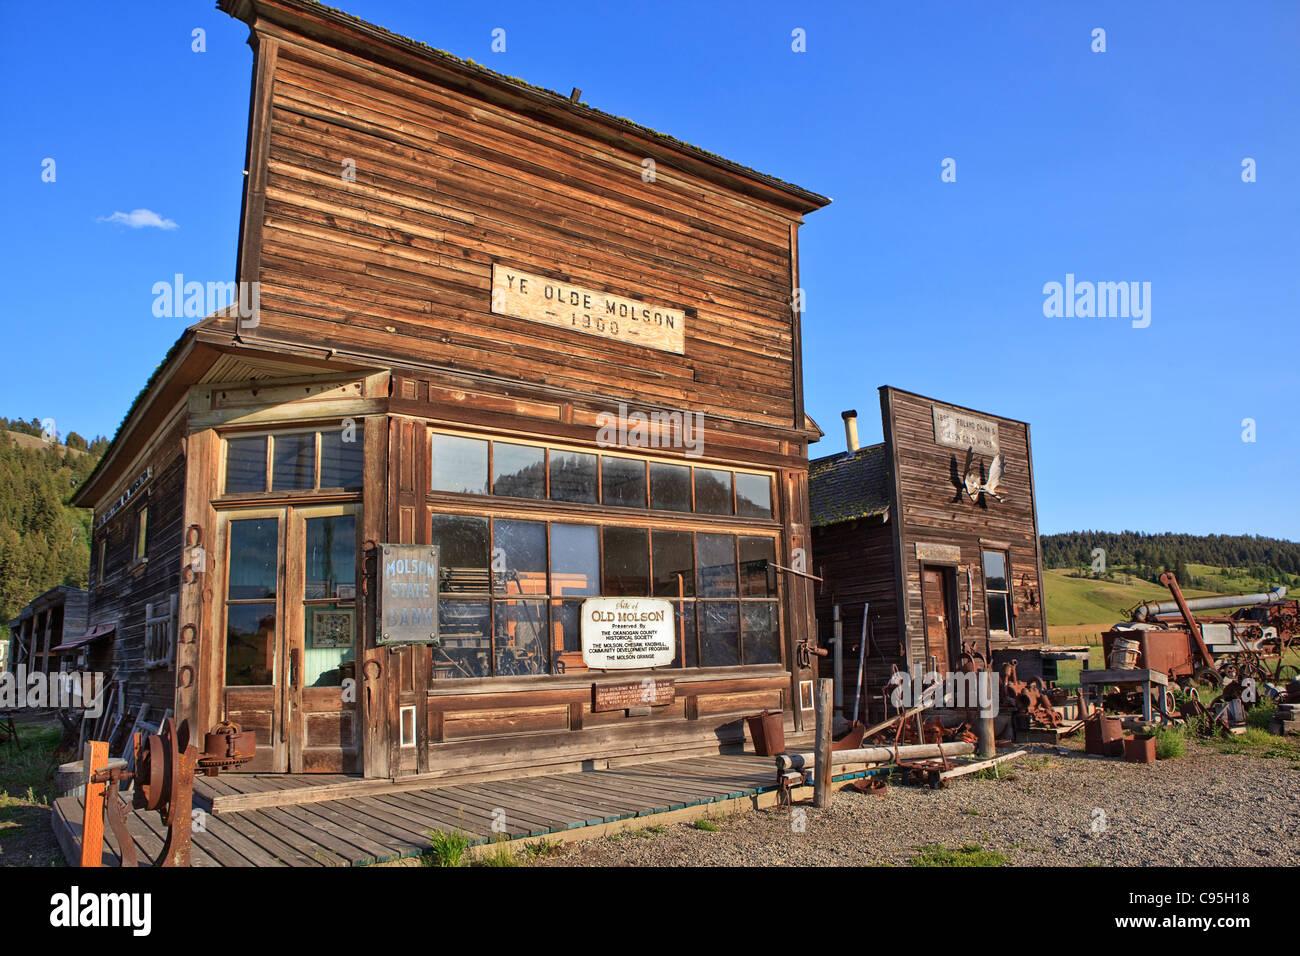 Image of the old Molson Bank building in Molson, Washington. - Stock Image